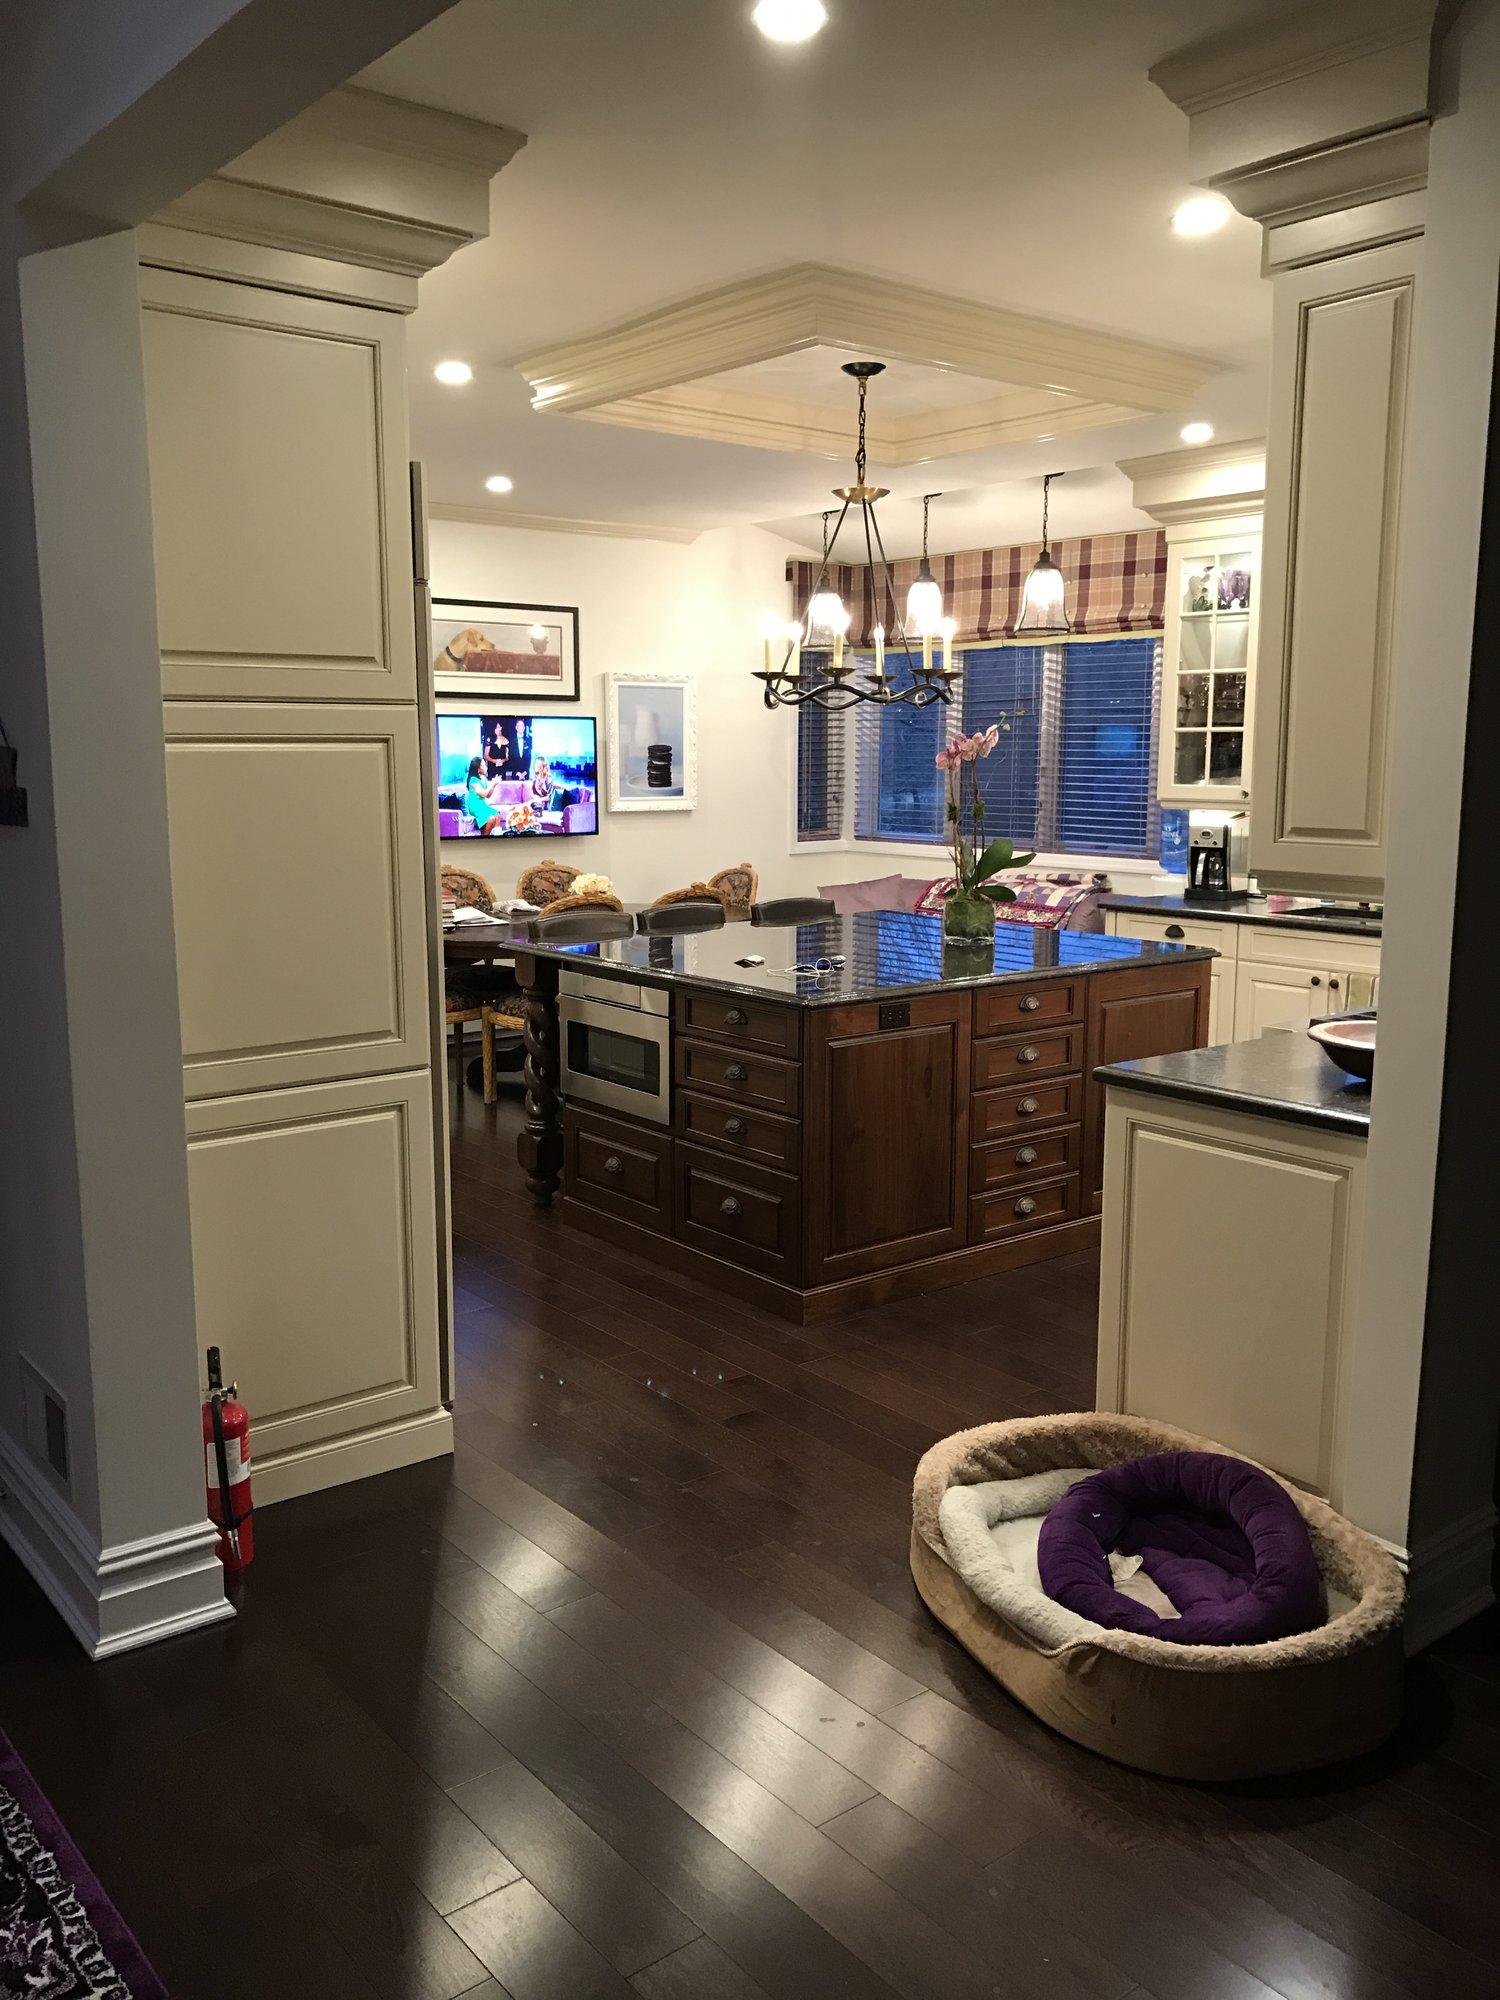 Kitchen Remodeling - Cabinetry & Design Showroom Long Island & NYC on elite furniture, elite clothing, elite entertainment, elite sinks, elite bath collection, elite lighting, elite phone, elite flooring,